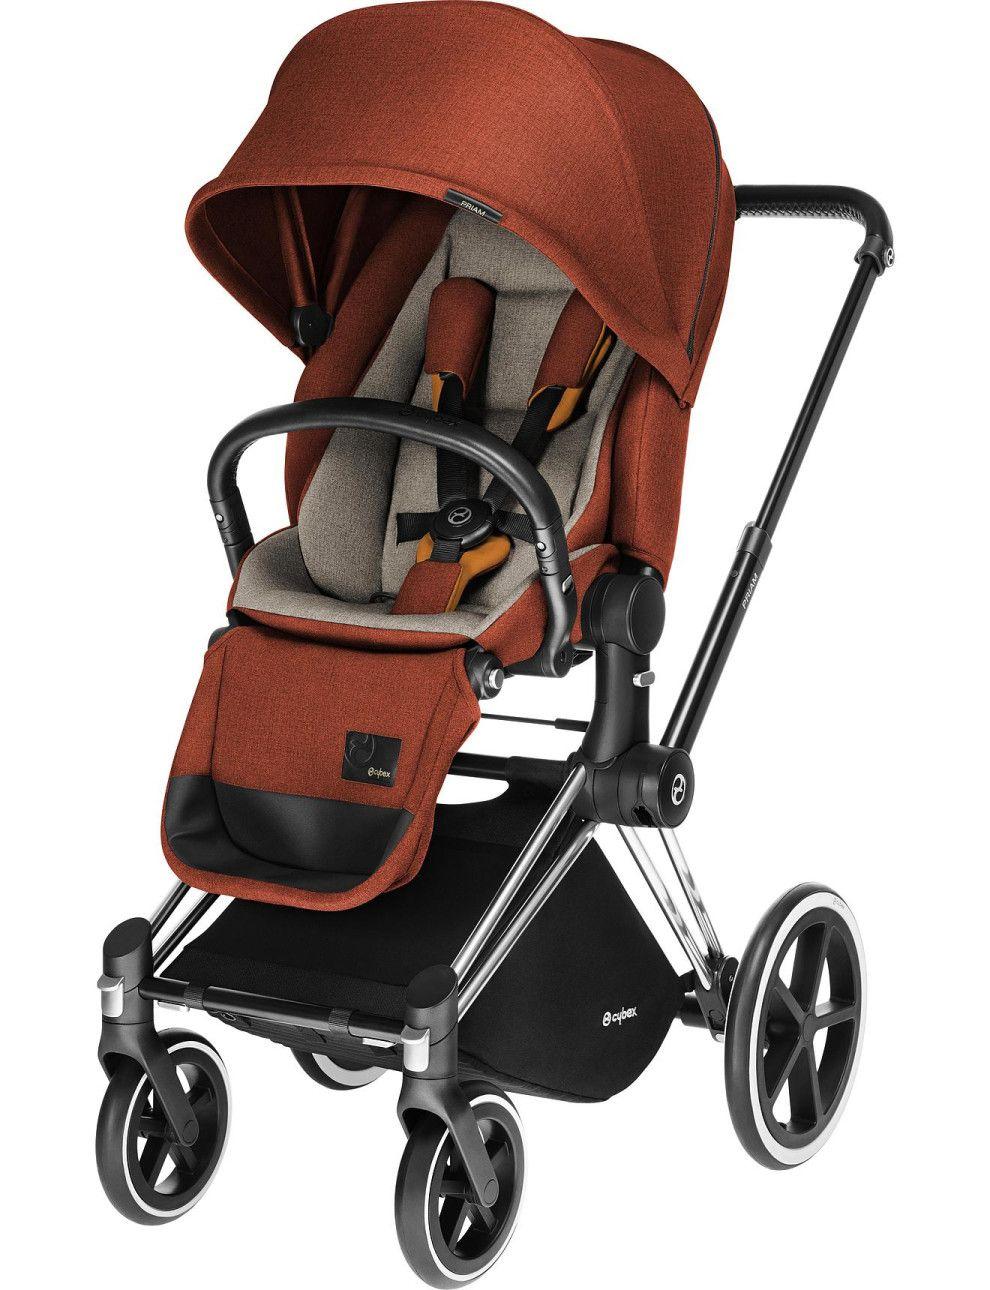 Priam Lux Seat Stroller David Jones Stroller, Stroller